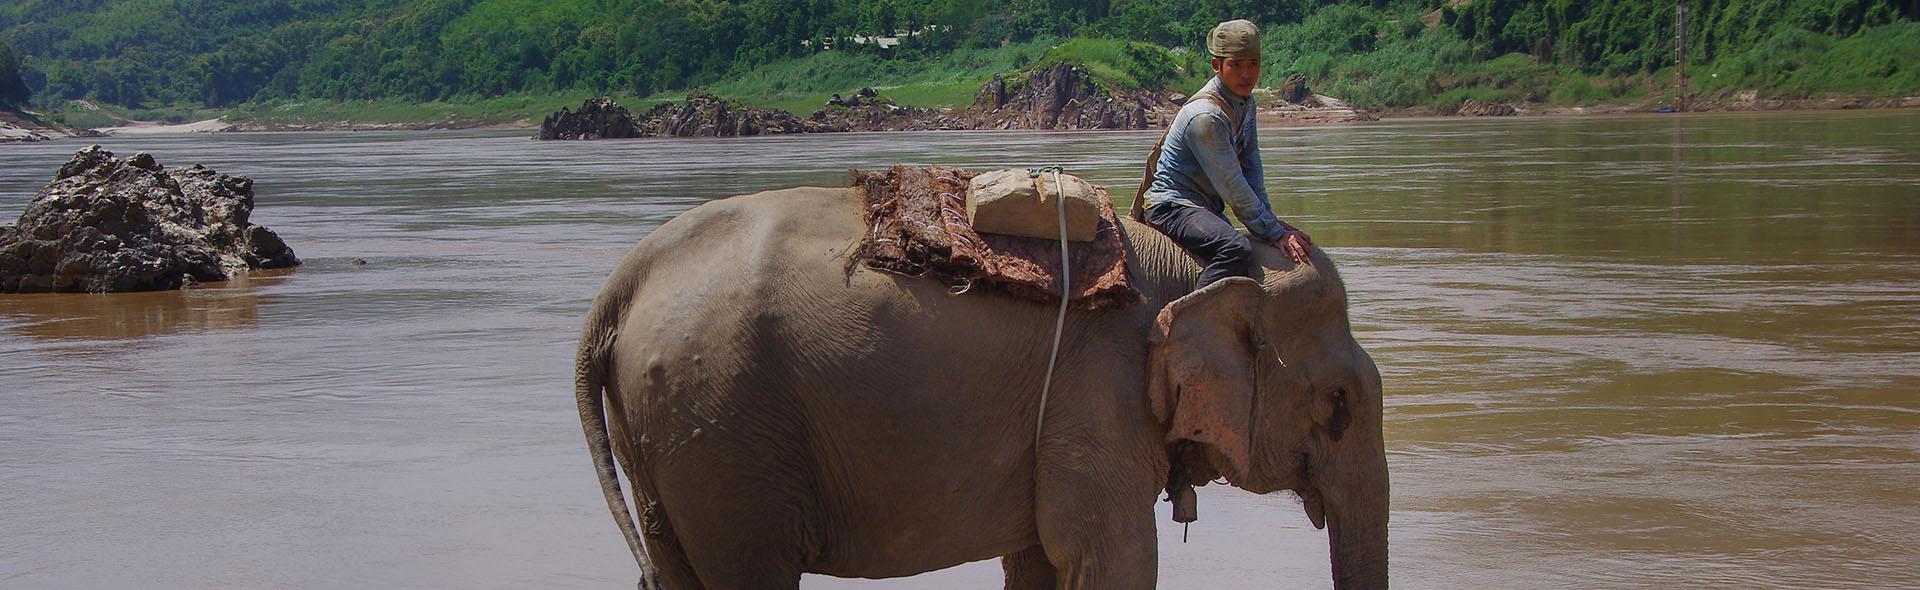 Elefantenjagd in Laos